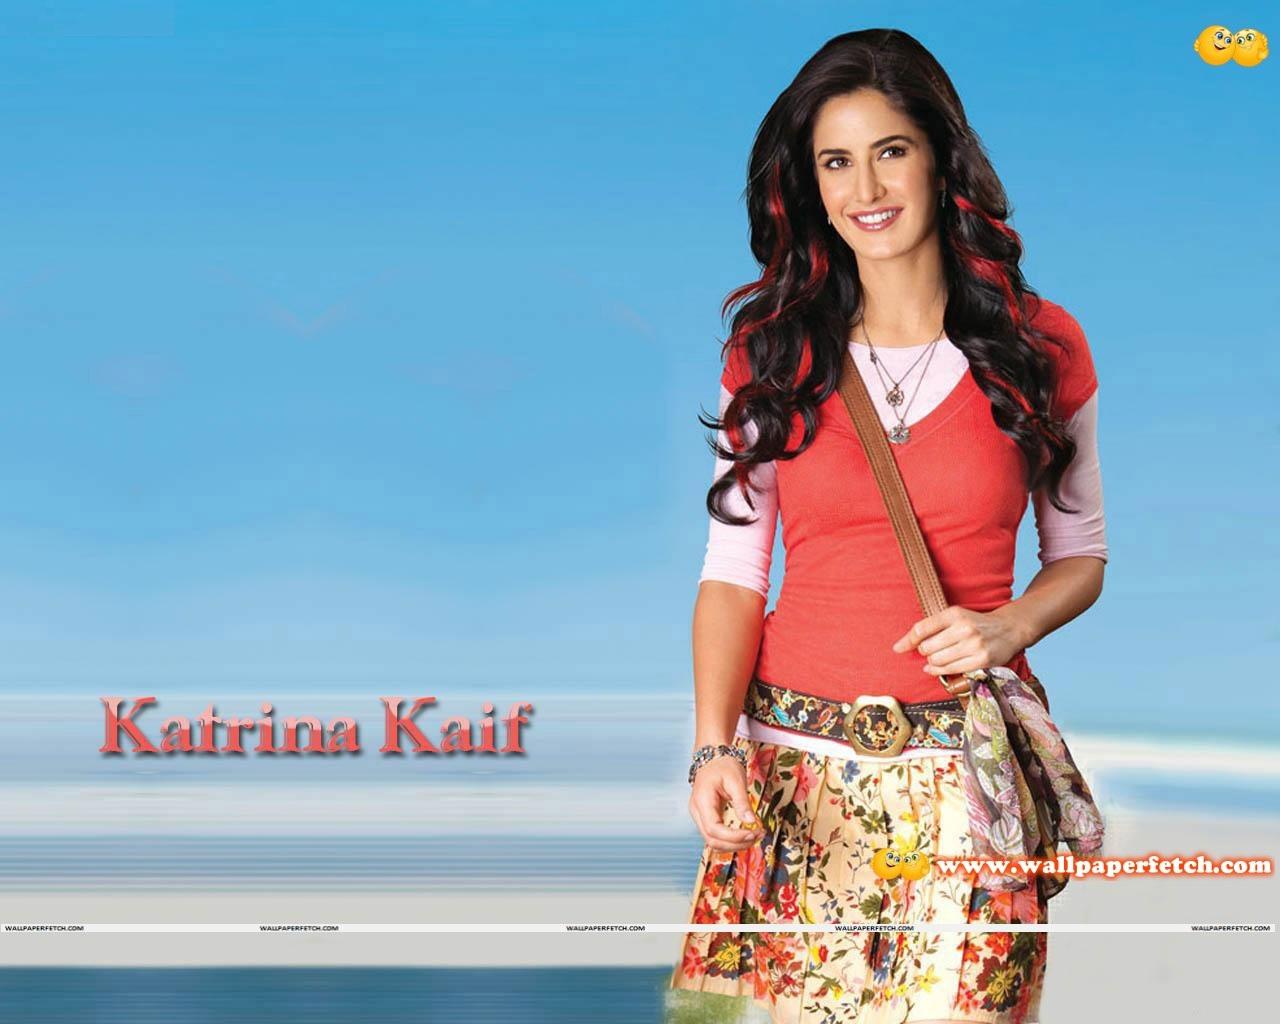 katrina kiaf wallpapers pack - photo #29